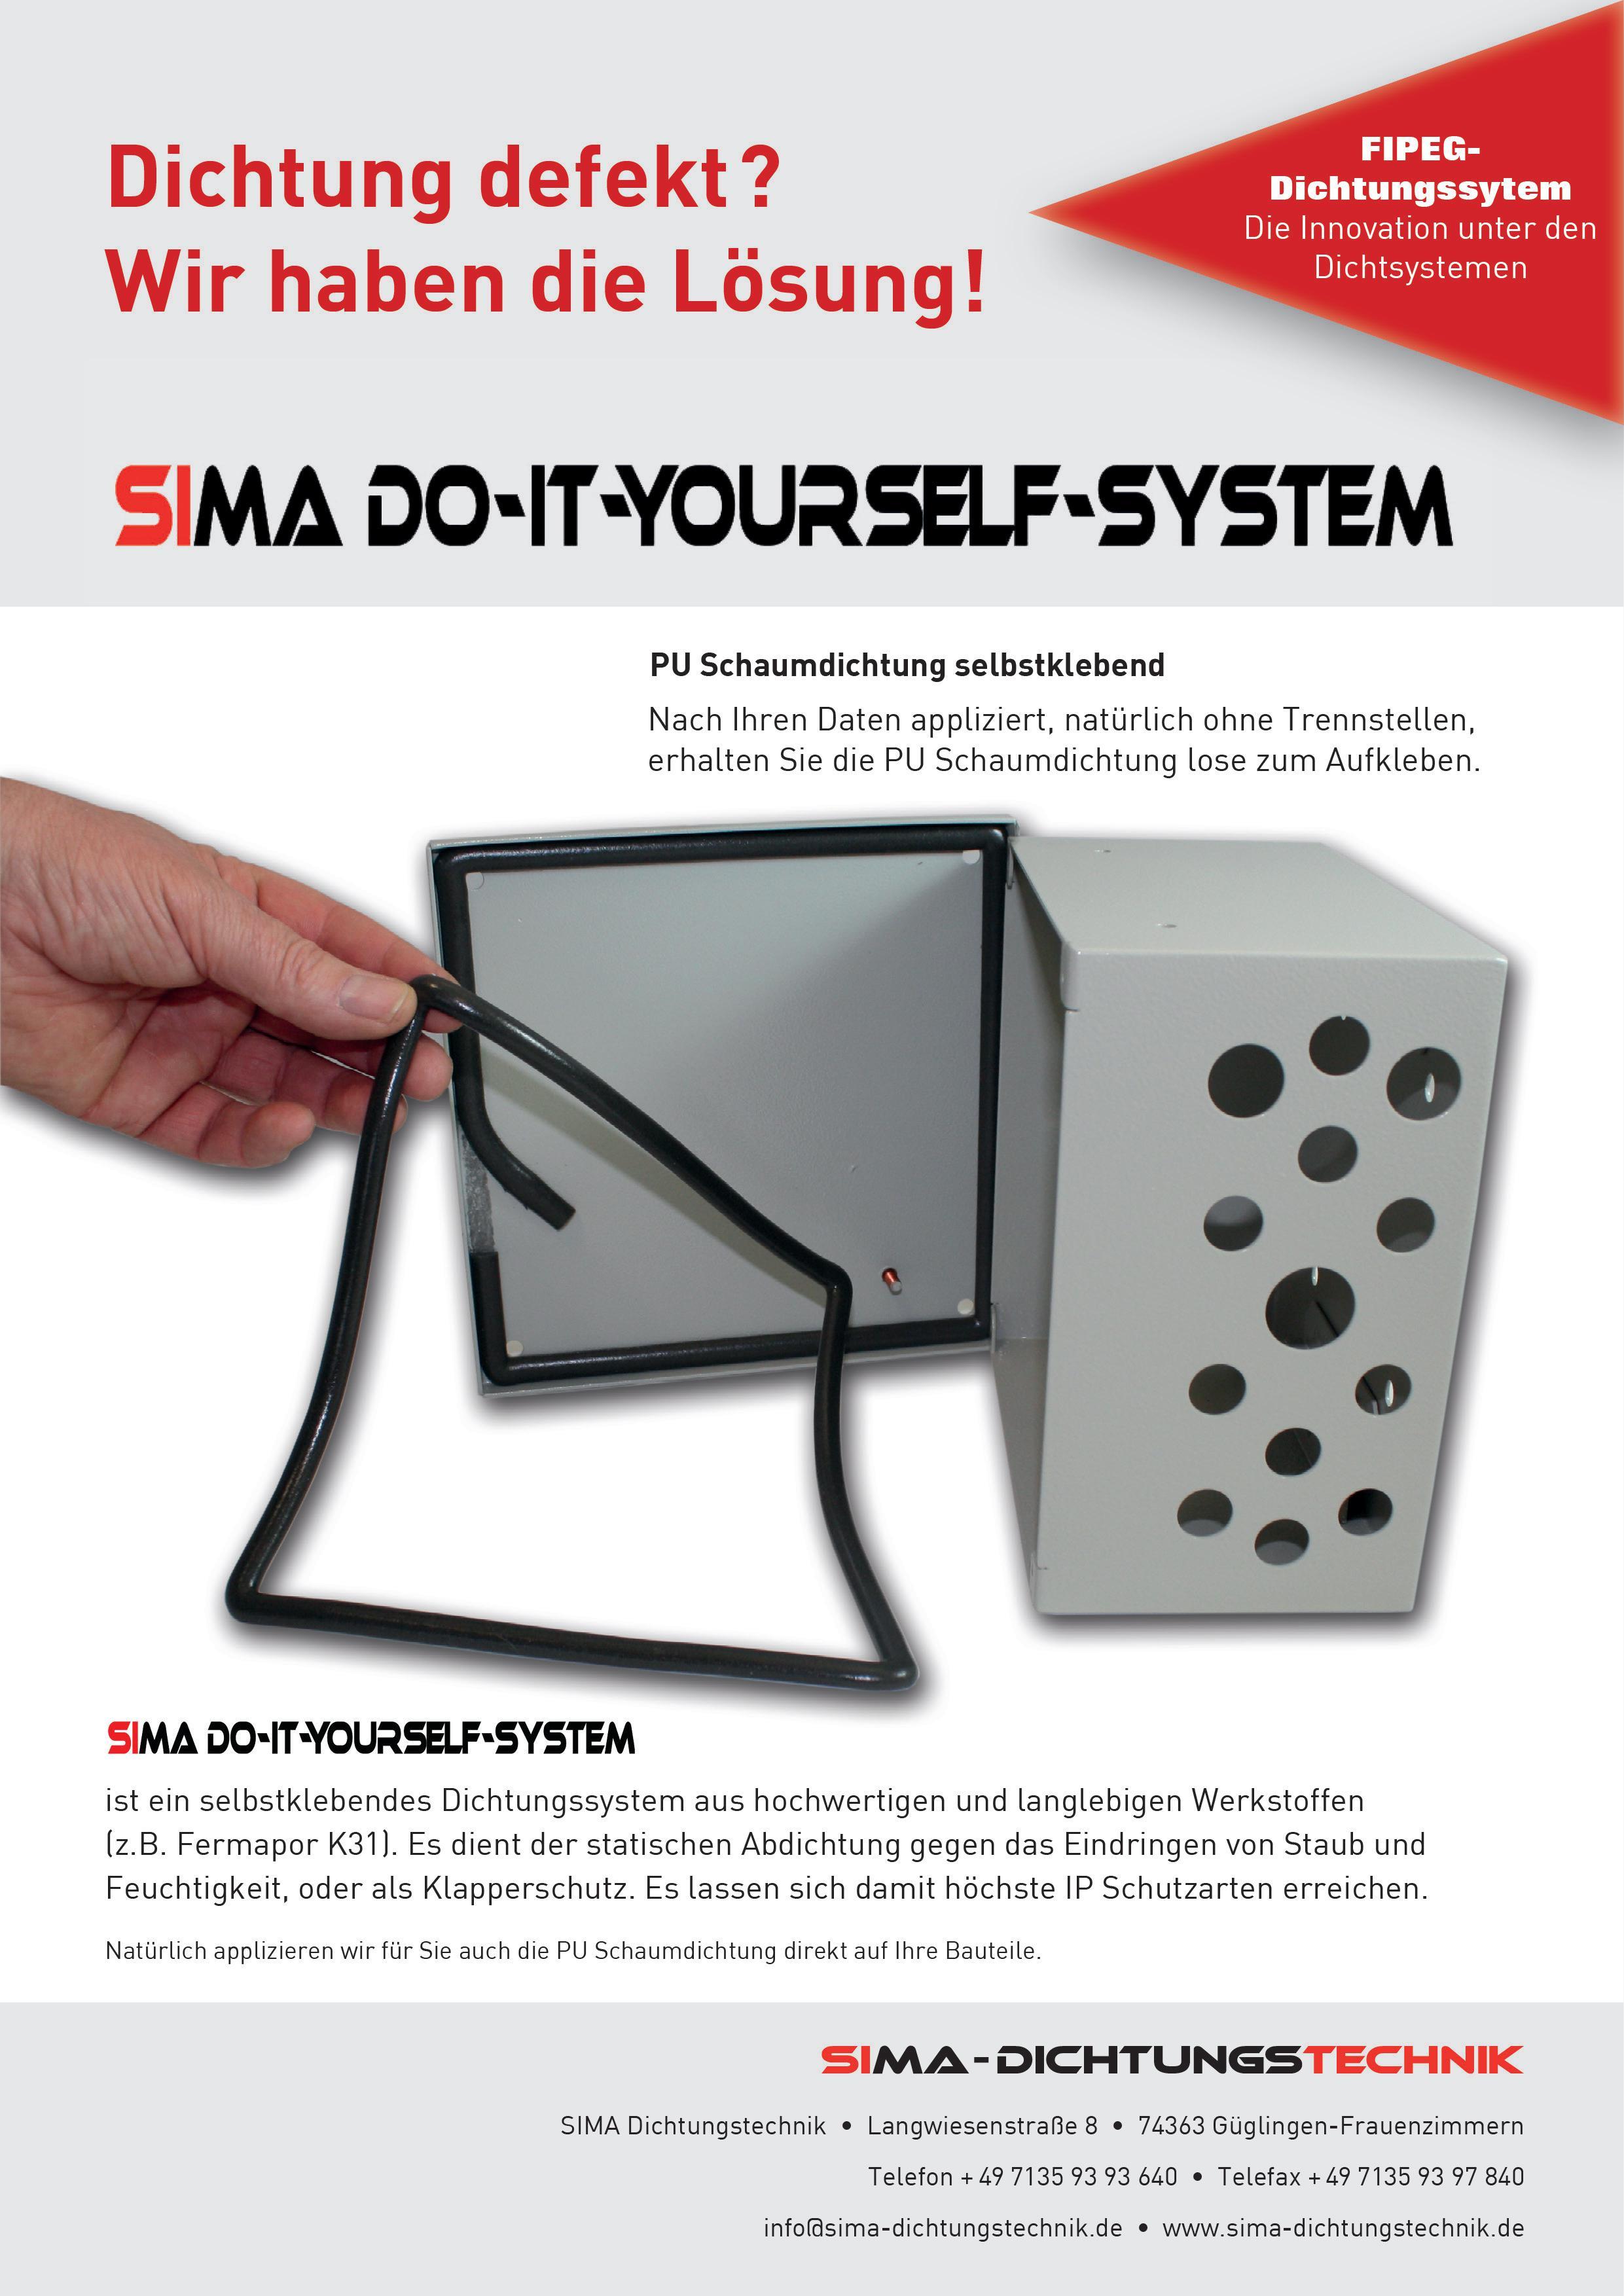 SIMA Dichtungstechnik